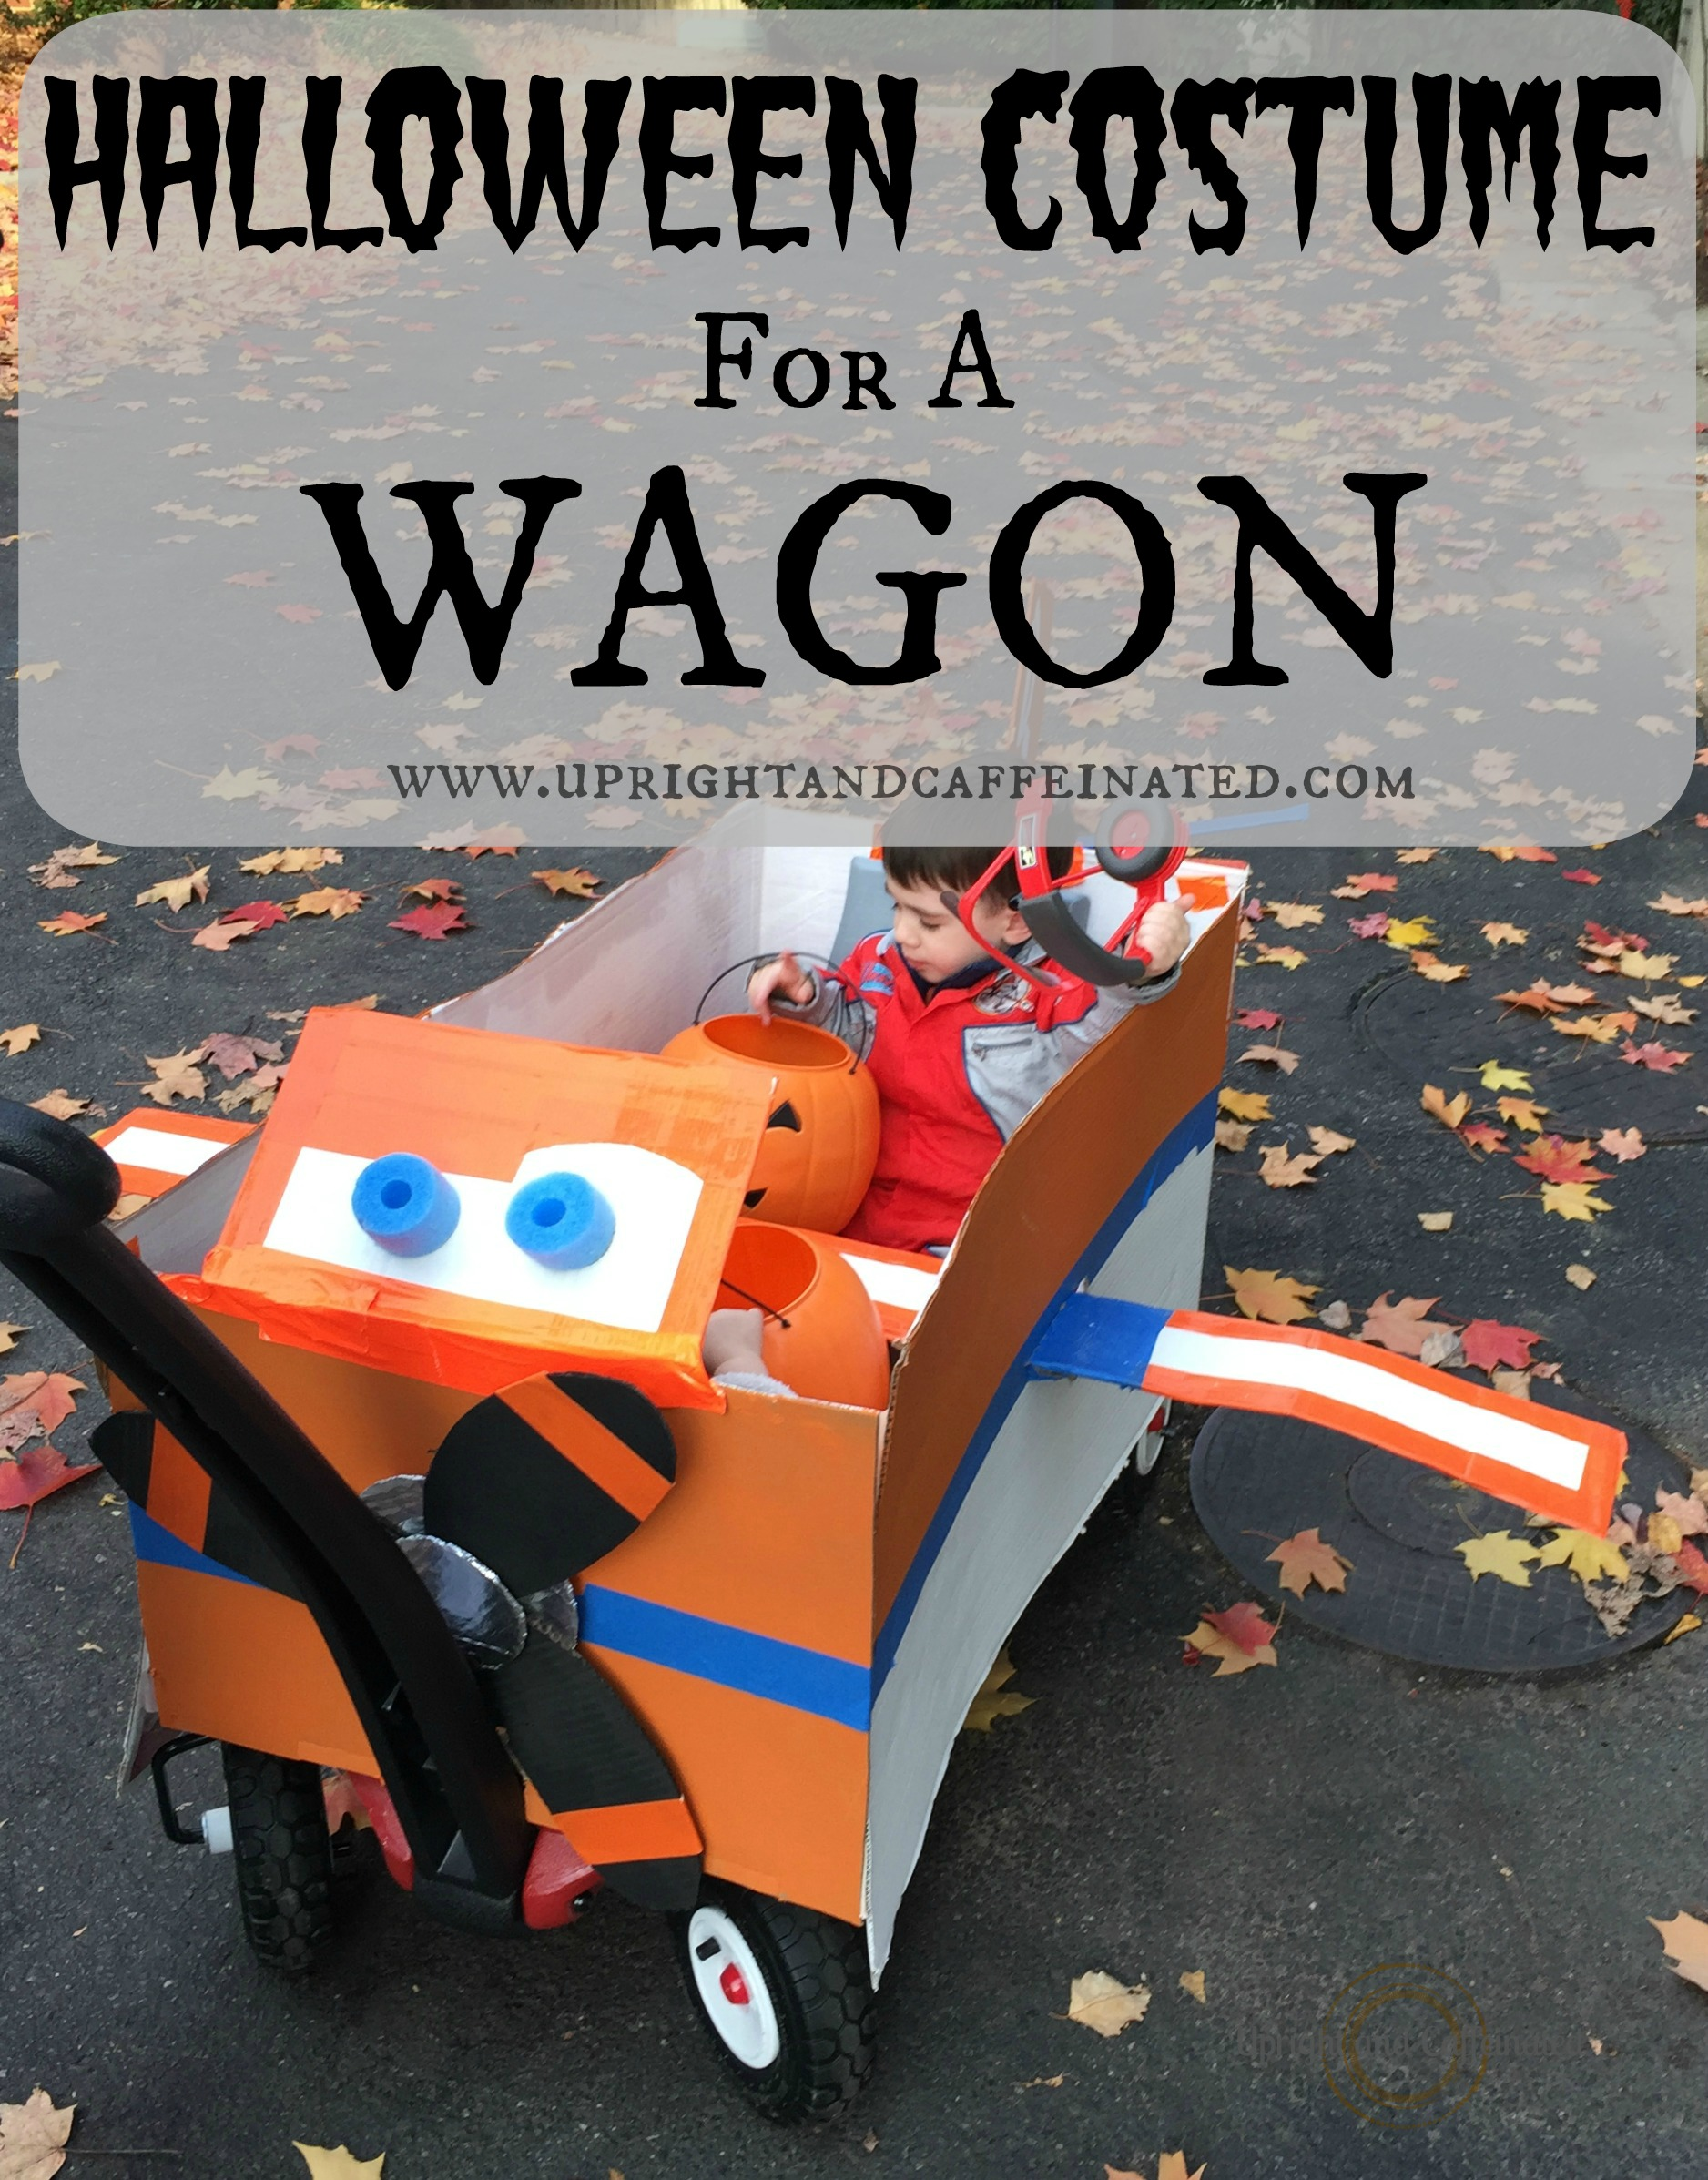 Halloween Costume For A Wagon